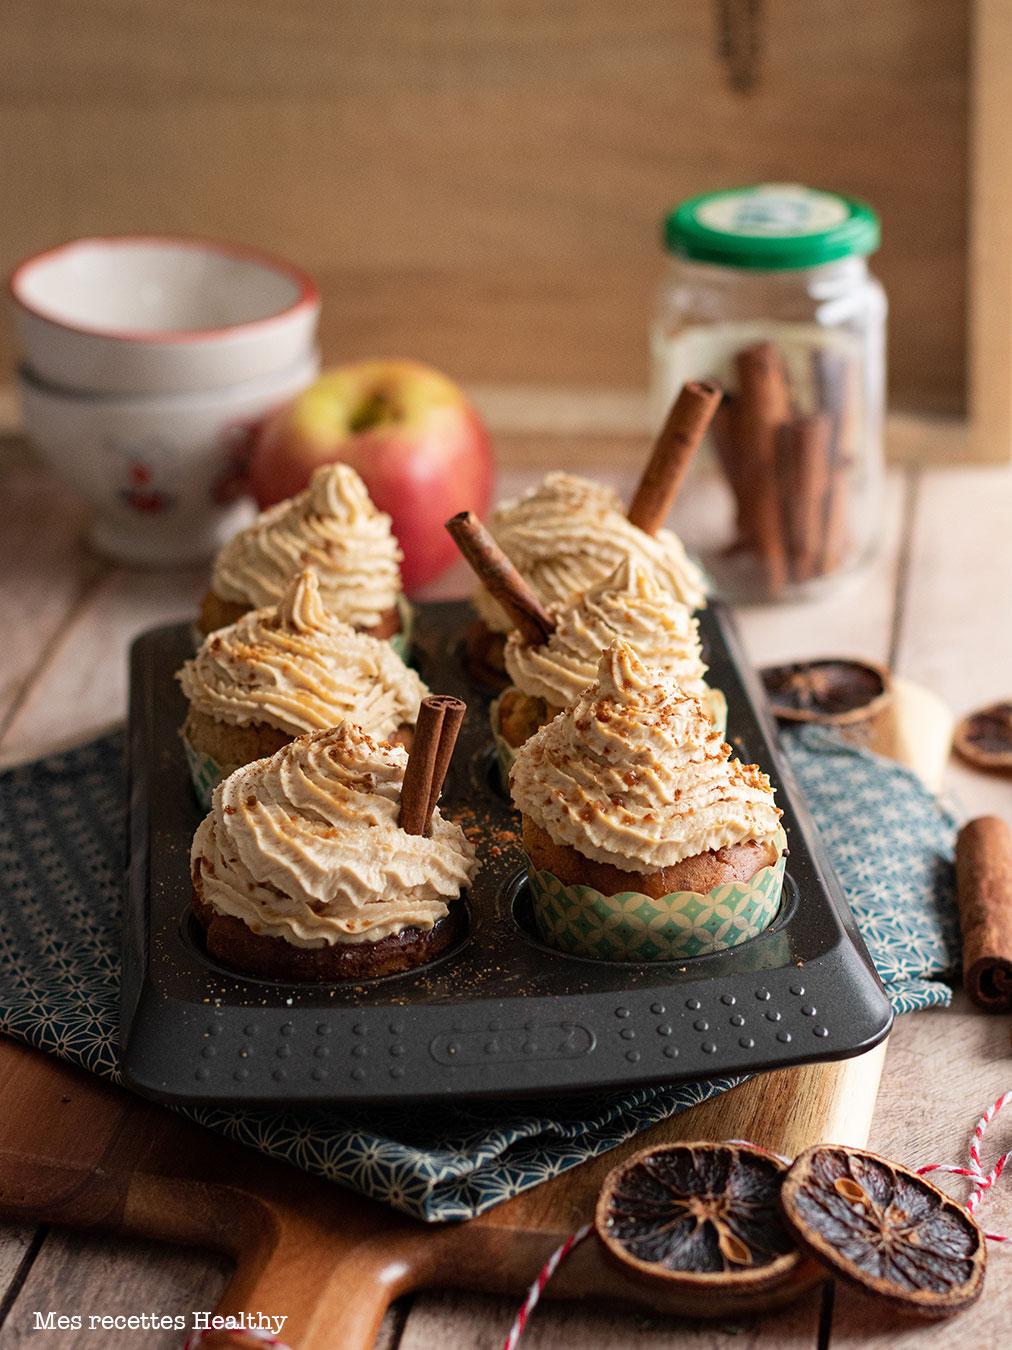 recette healthy-cupcake canelle-moelleux-mascarpone